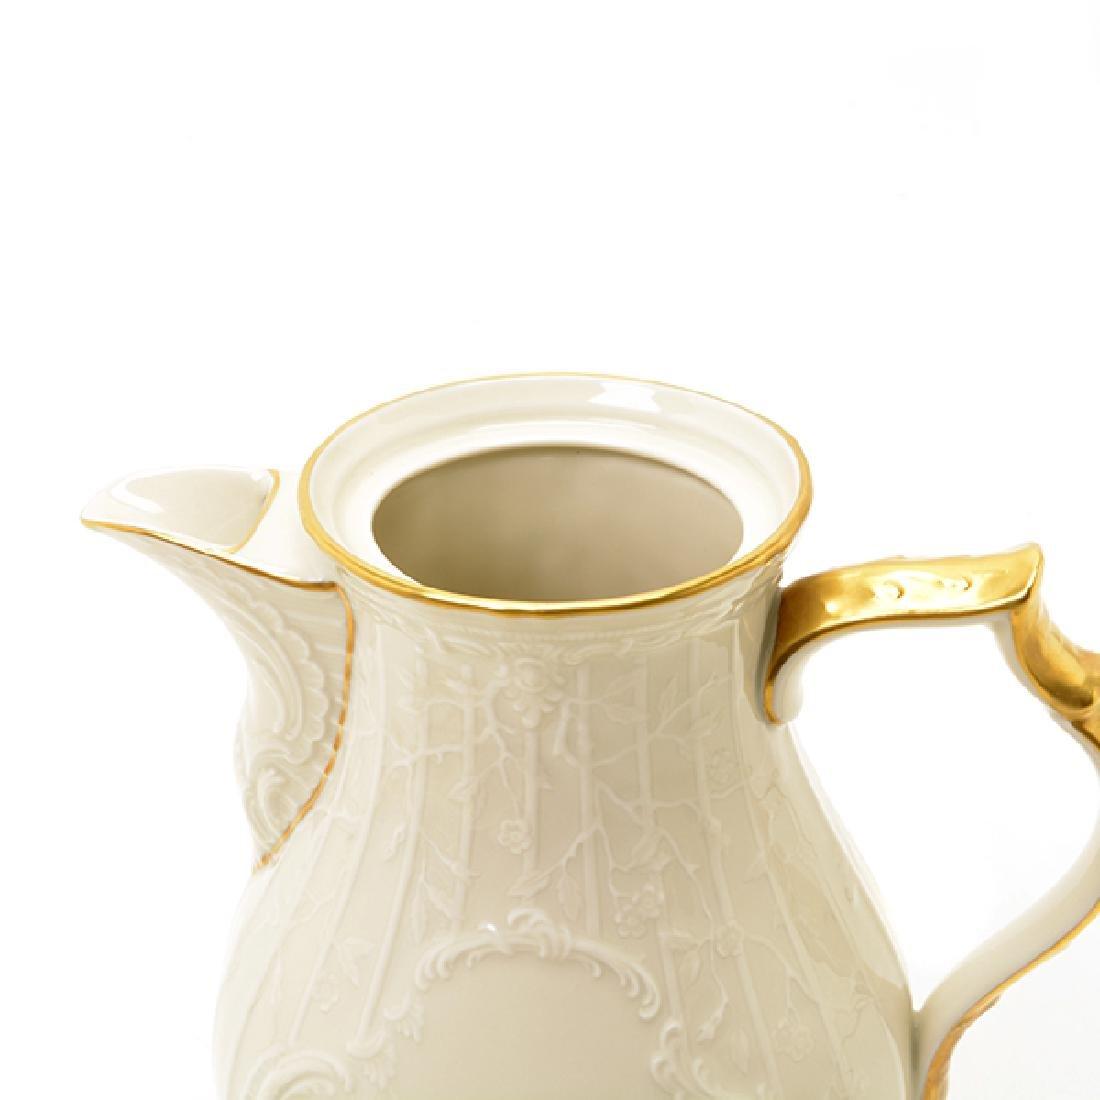 Rosenthal Sans Souci Porcelain Dinner Service - 7